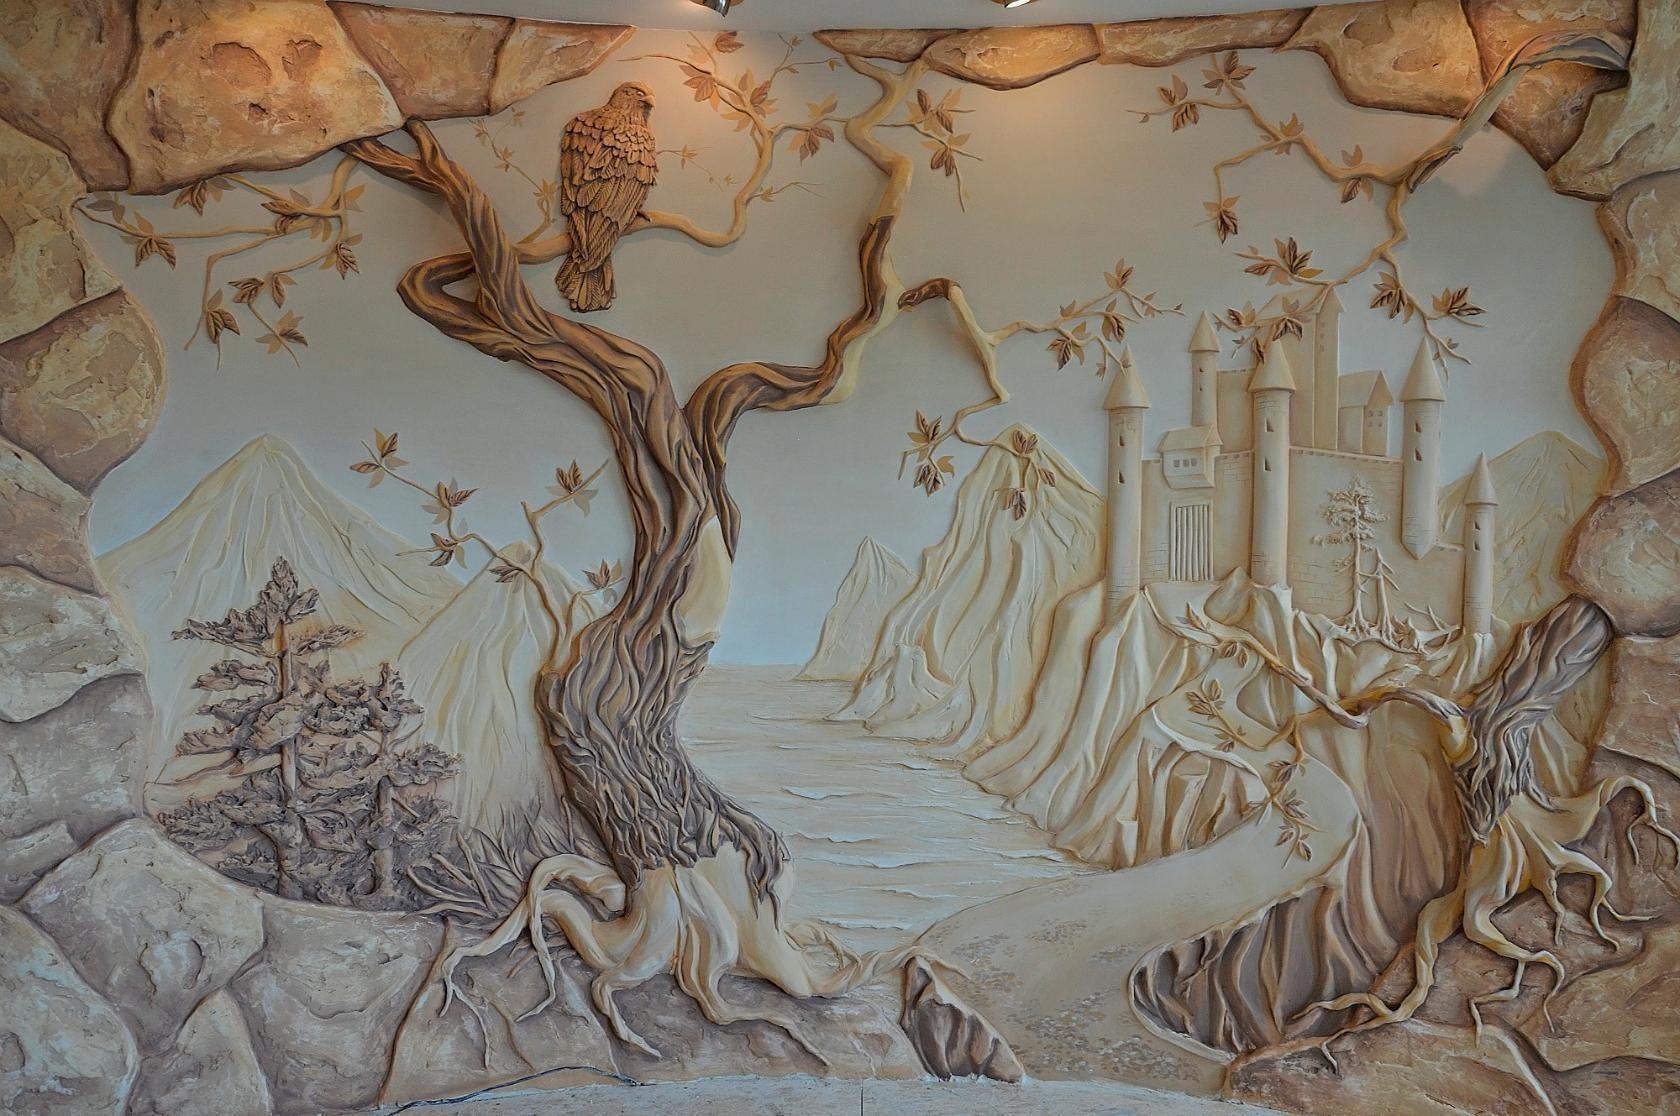 объемные рисунки из гипса на стене